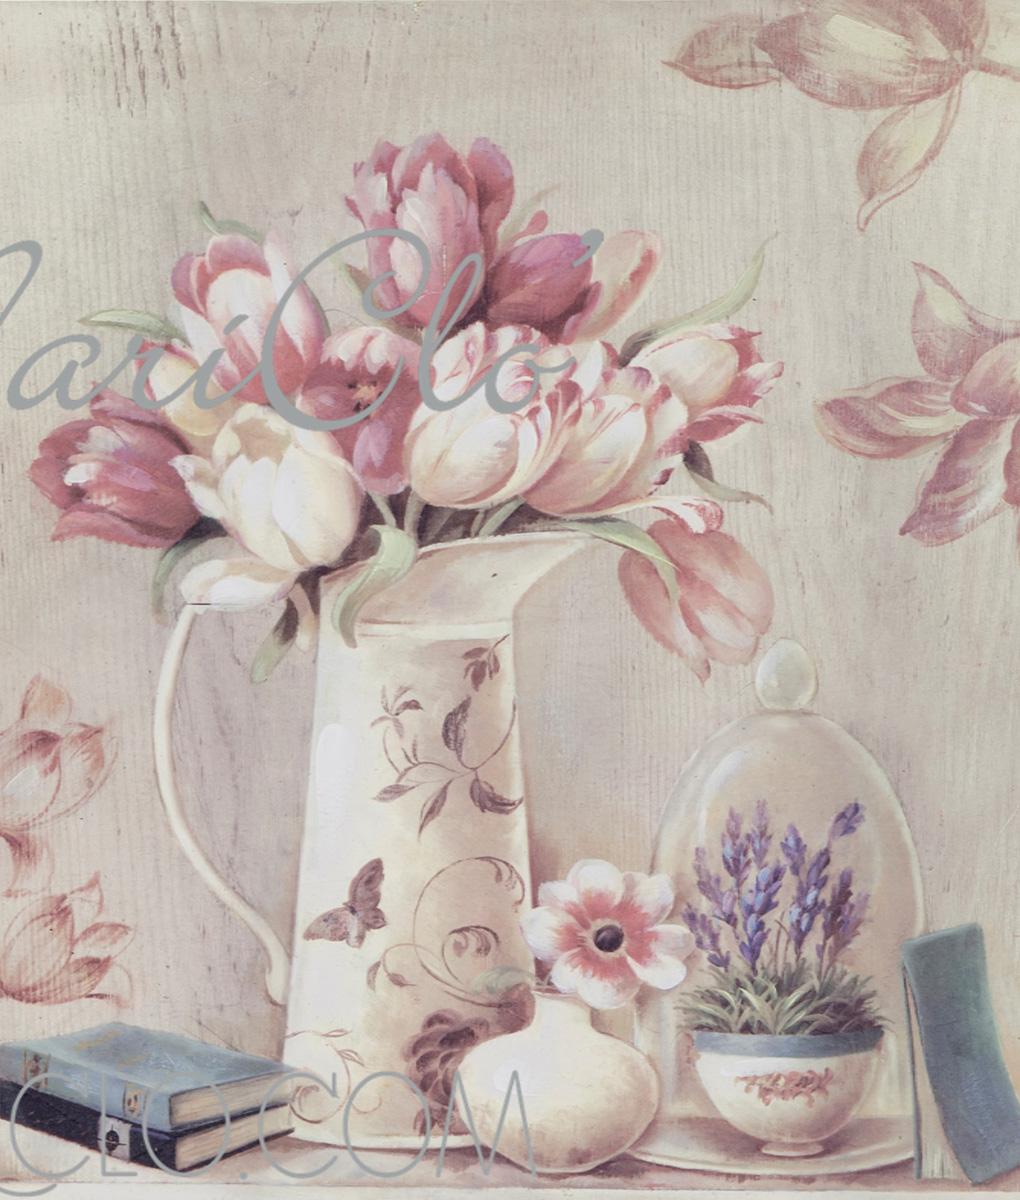 Quadro vaso con tulipani cm 50x50x3 - Blanc MariClo\' Reggio Emilia